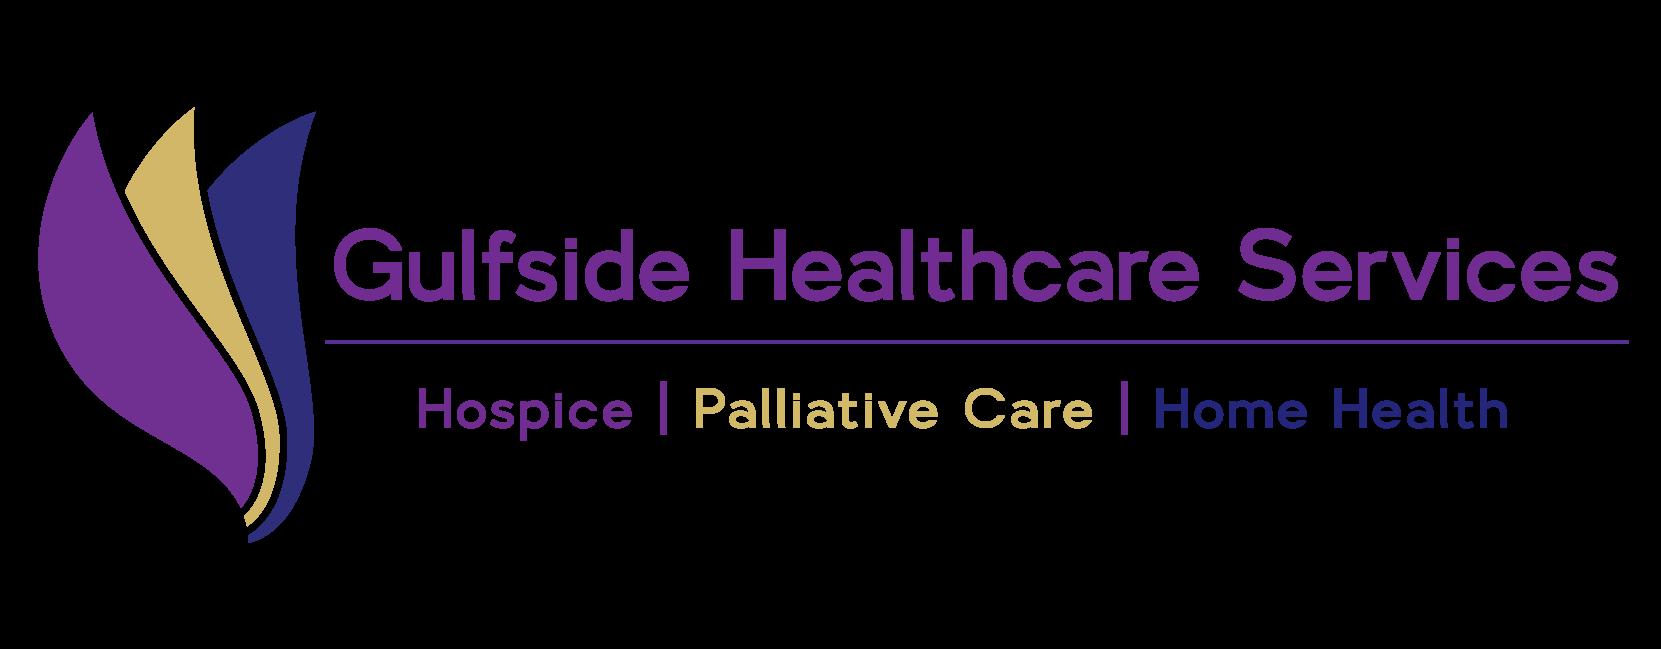 Gulfside Healthcare Services Logo